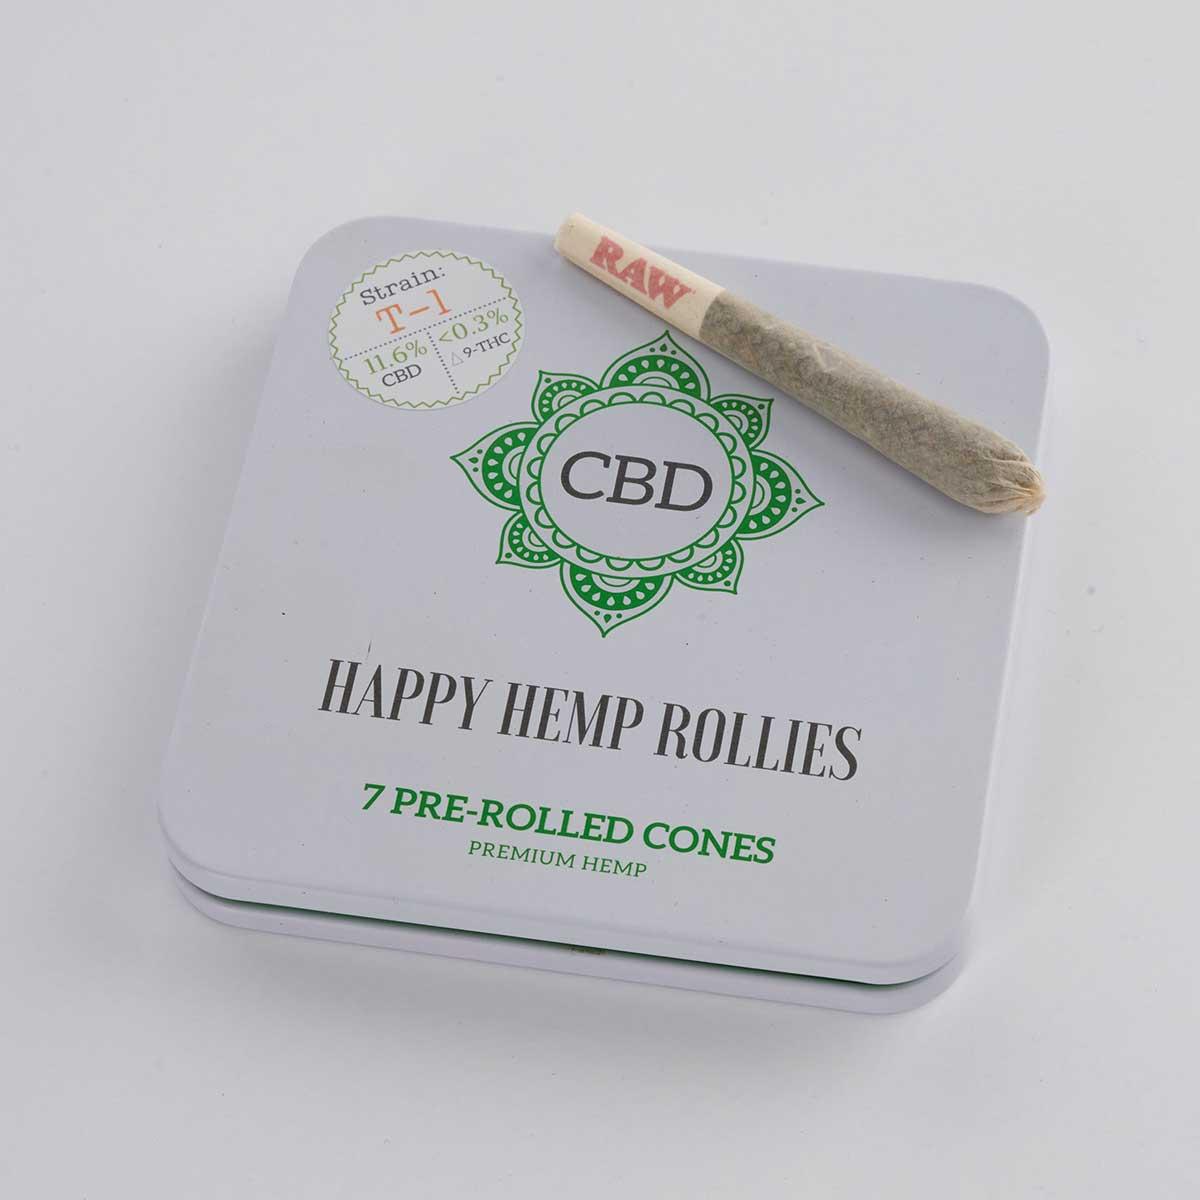 Premium CBD Hemp Pre-Rolls 7 Pack